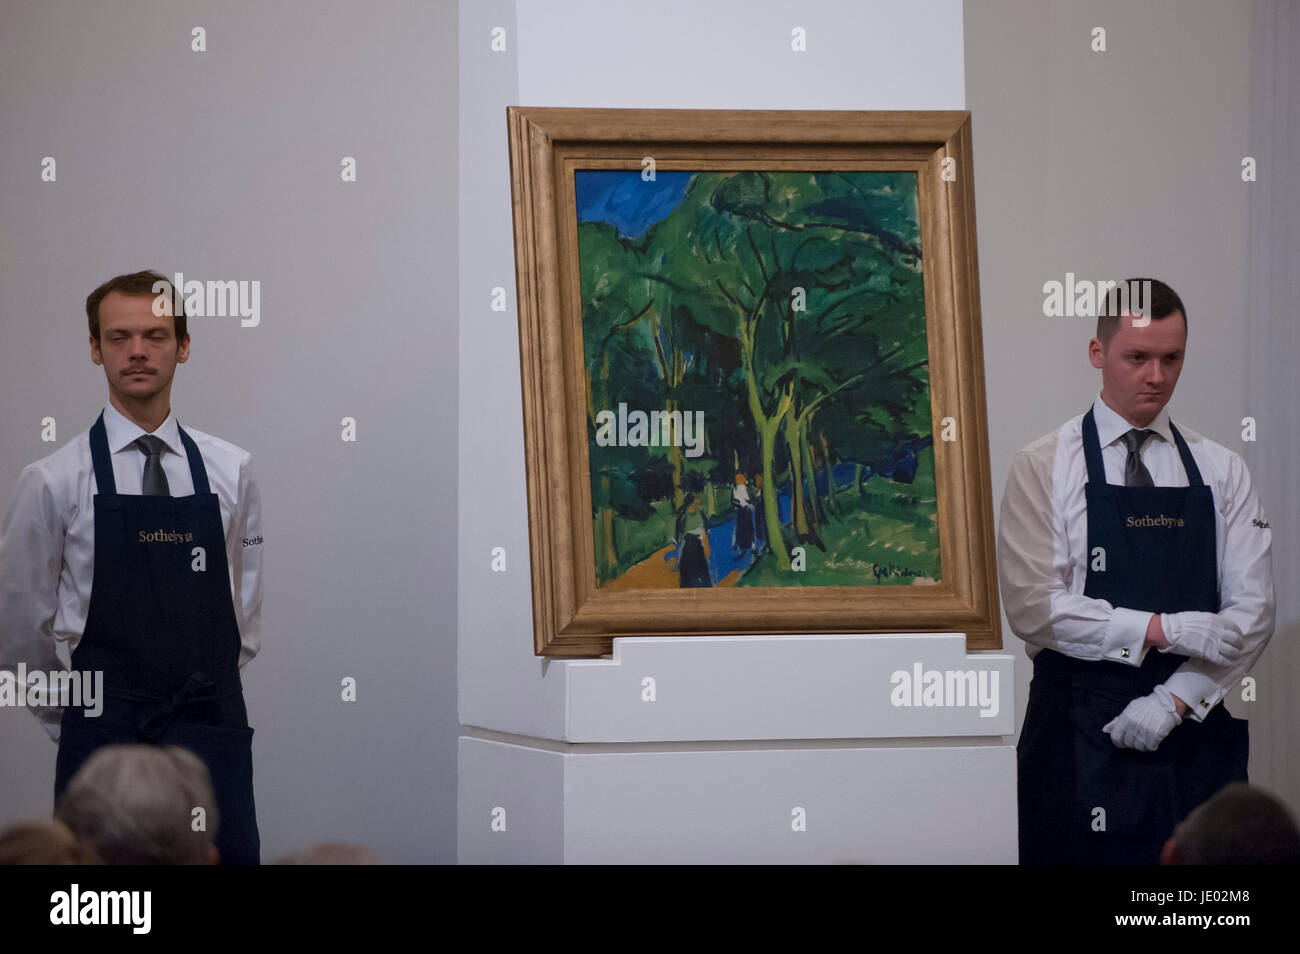 London, UK.  21 June 2017. 'Waldstrasse (Forest Road)' by Ernst Ludwig Kirchner sold for a hammer price - Stock Image